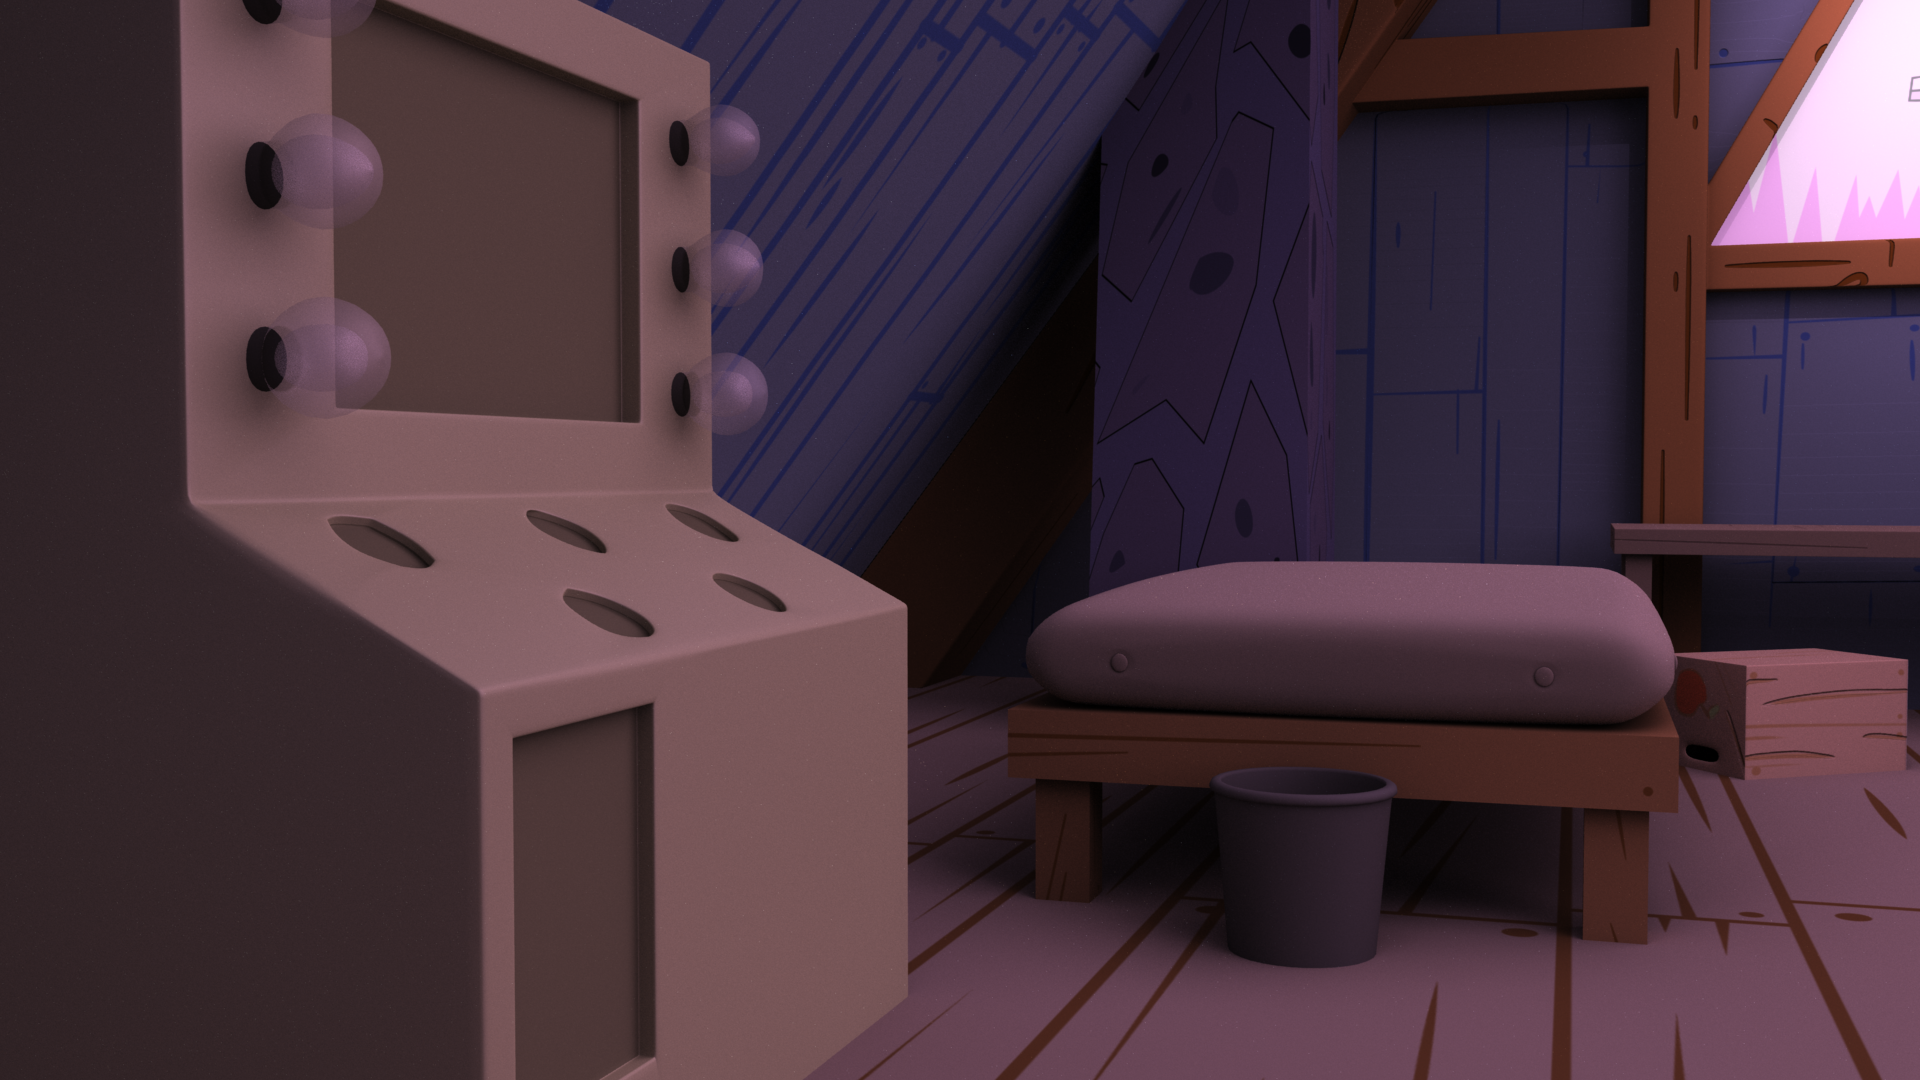 Gravity Falls Bedroom Mock Up - #4